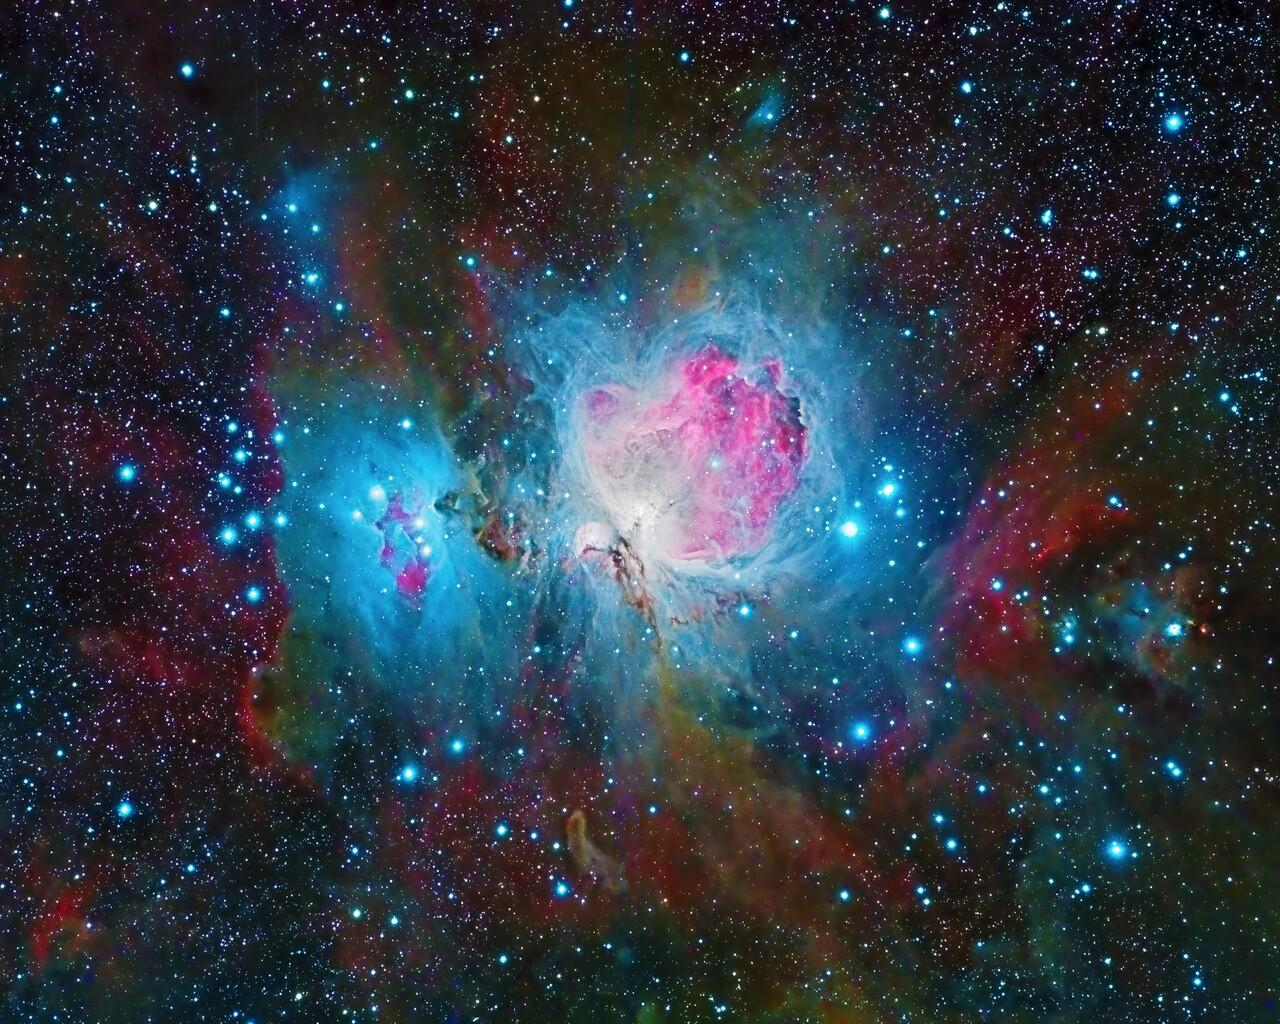 1280x1024 Nebula Space Galaxy Colorful 4k 1280x1024